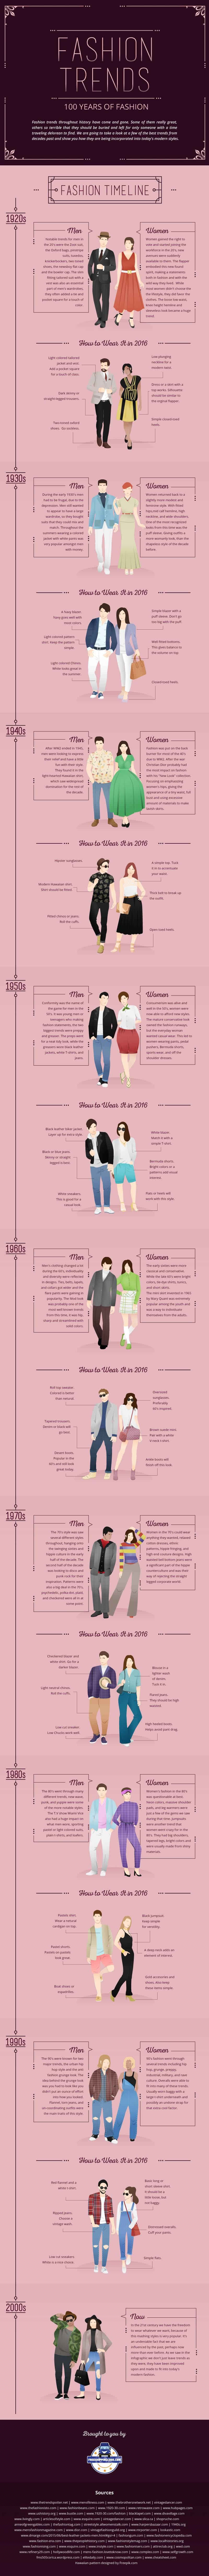 The Revolving Door of Fashion